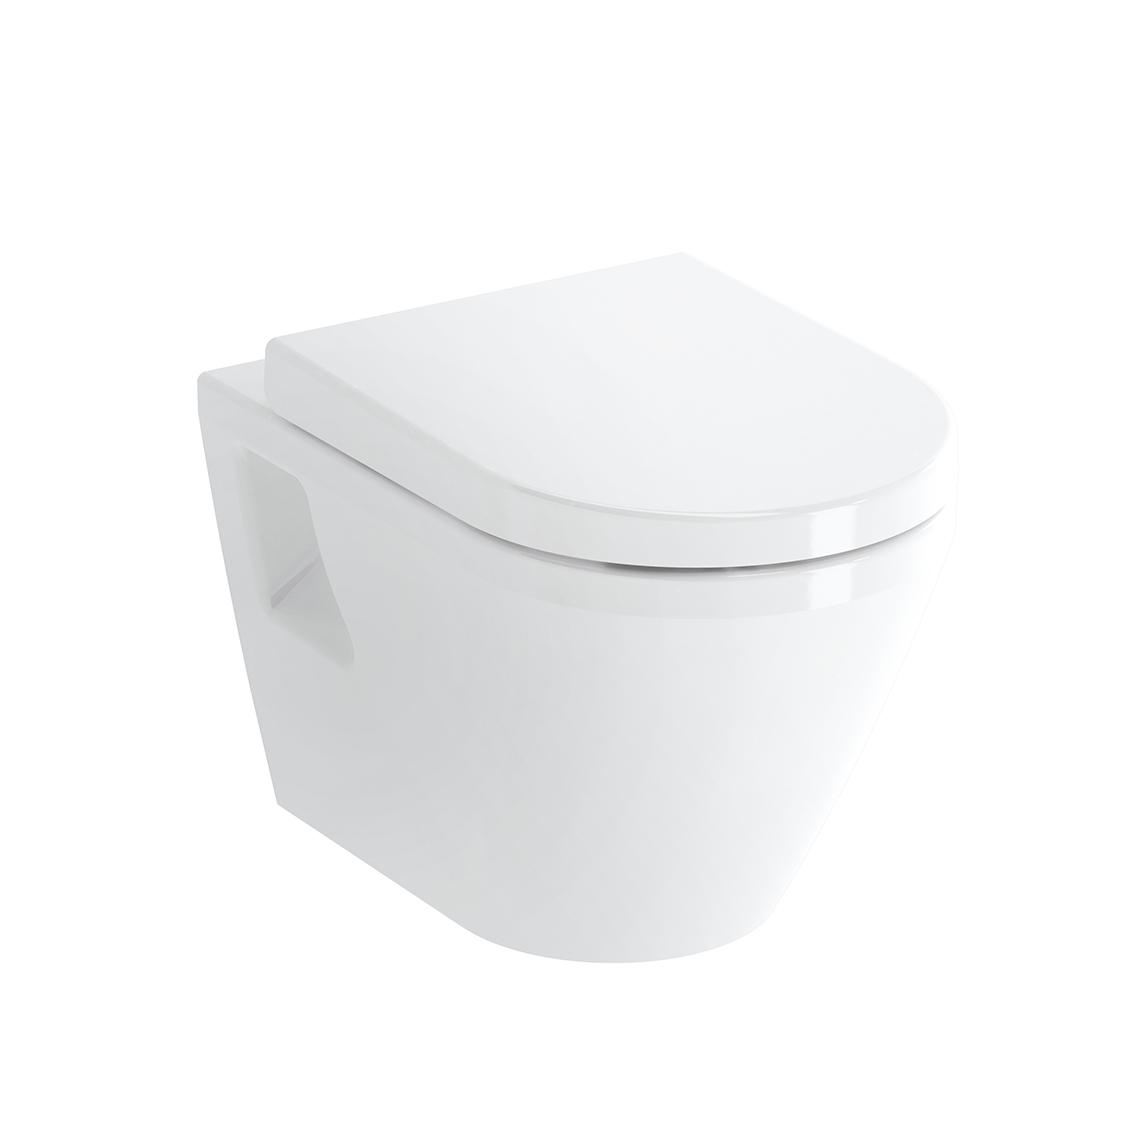 Integra Wand-WC VitrA Flush 2.0 (ohne Spülrand), mit Bidetfunktion, Tiefspüler